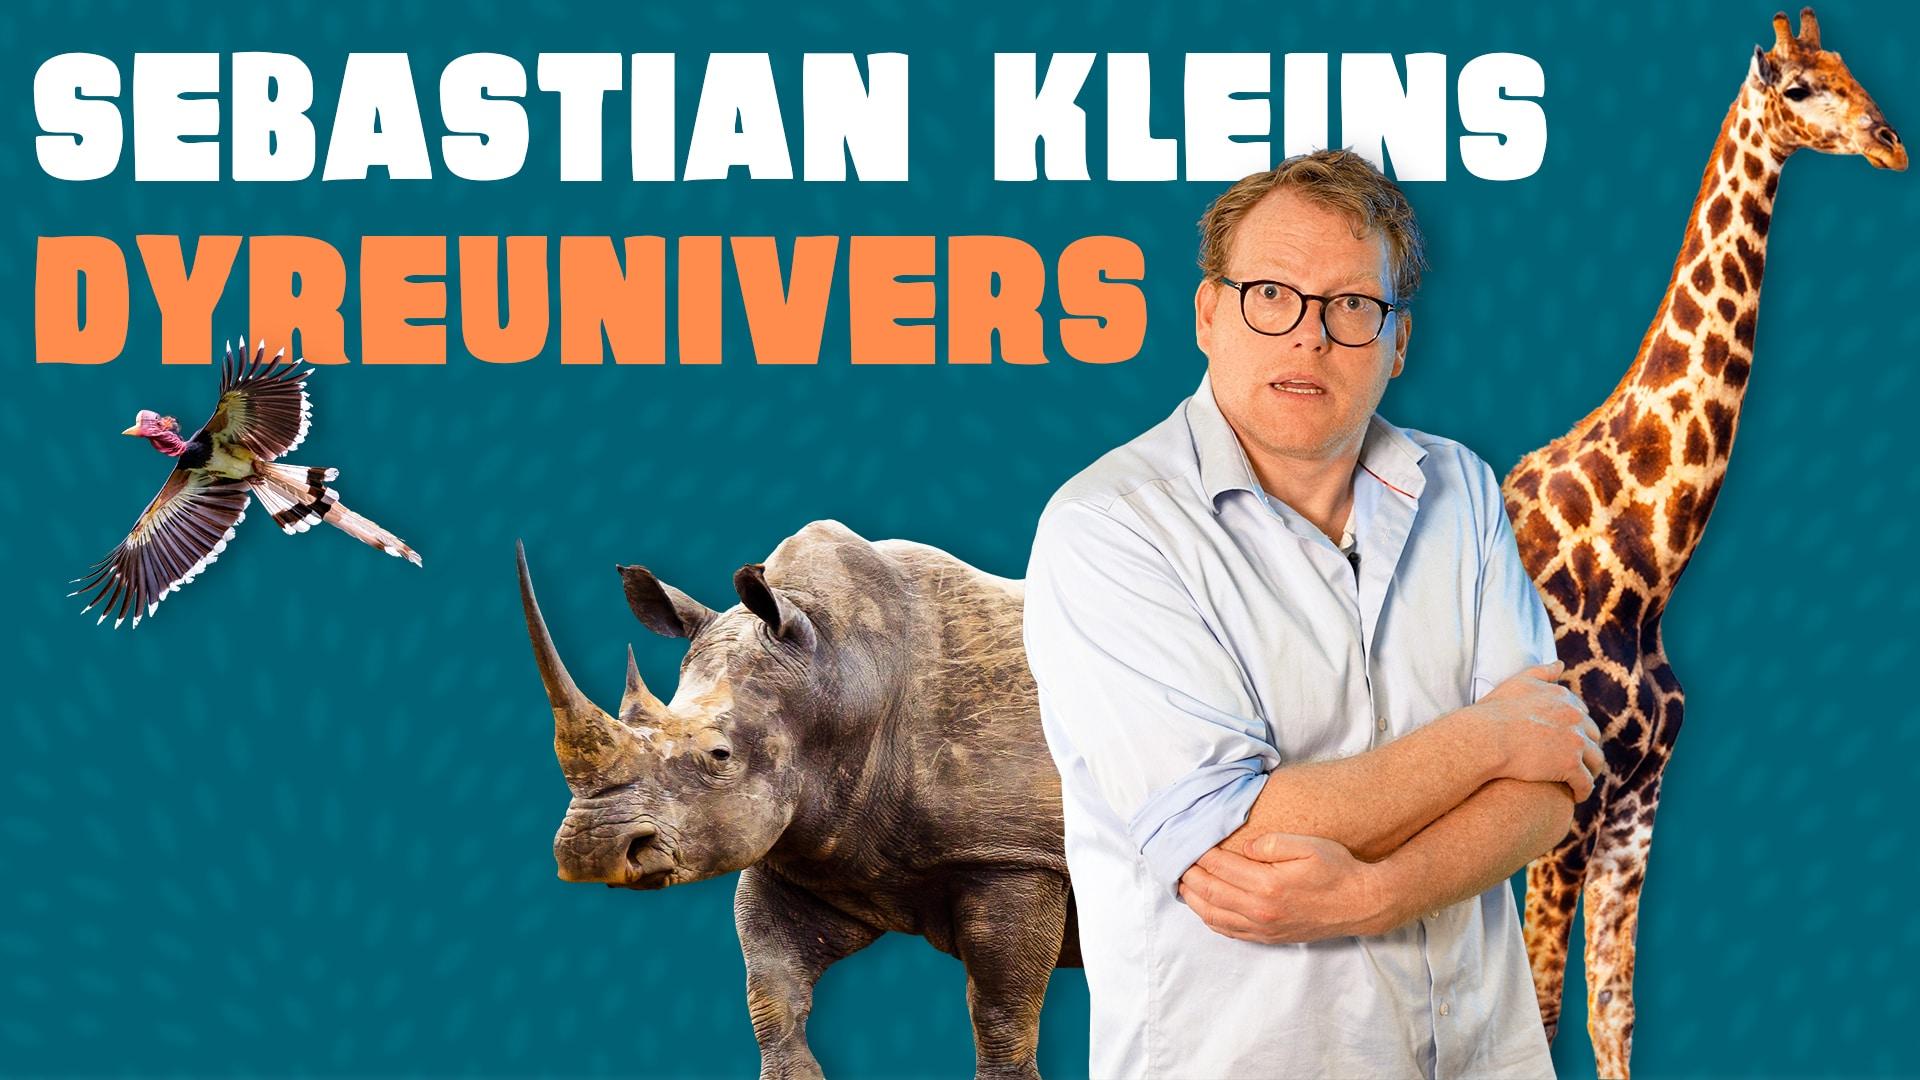 Sebastian Kleins dyreunivers